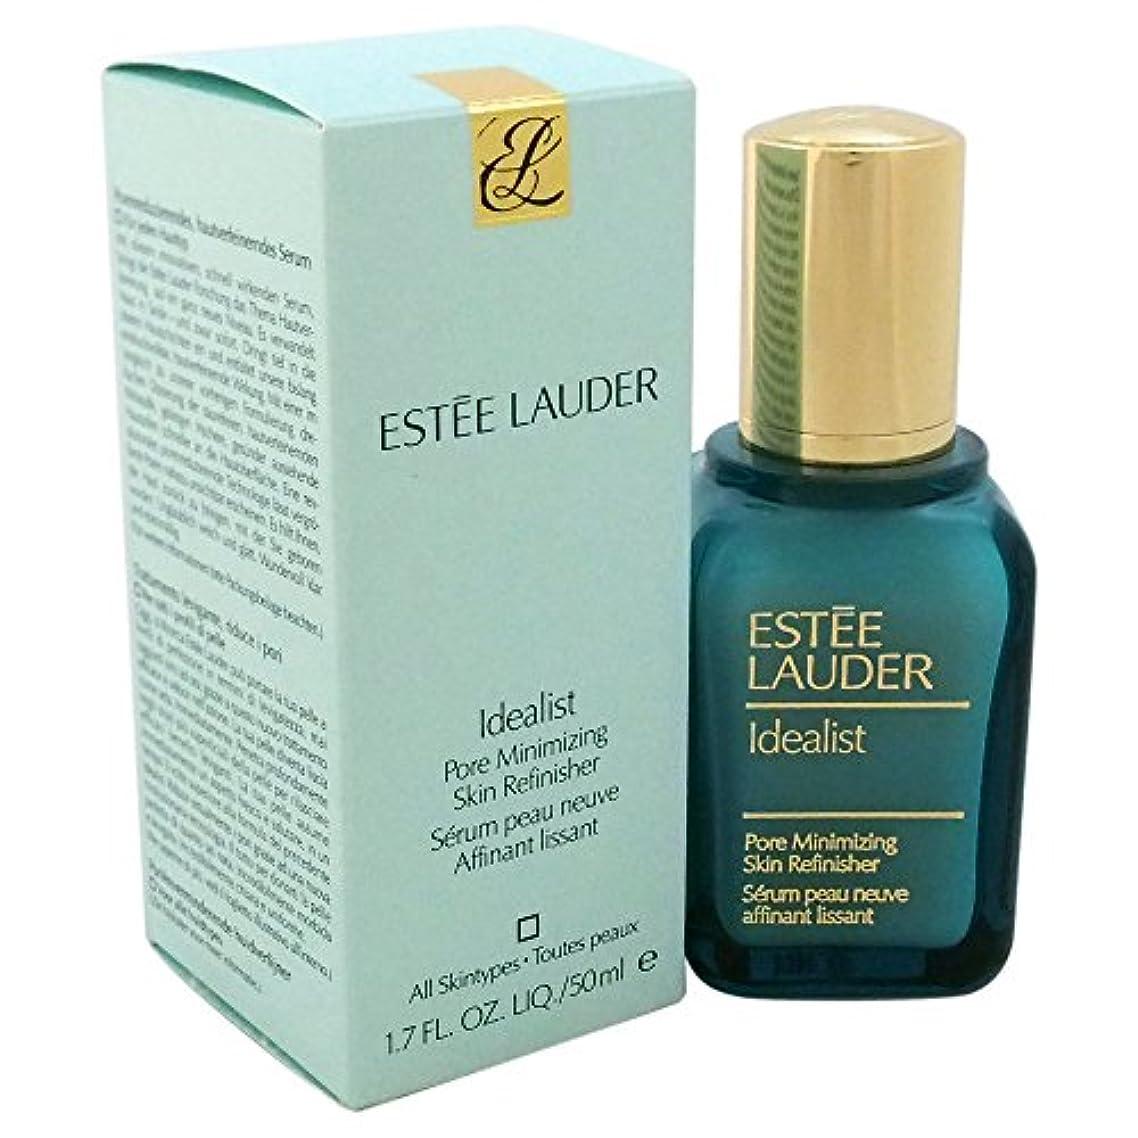 型注釈手荷物Estee Lauder Idealist Pore Minimizing Skin Refinisher 50ml [並行輸入品]